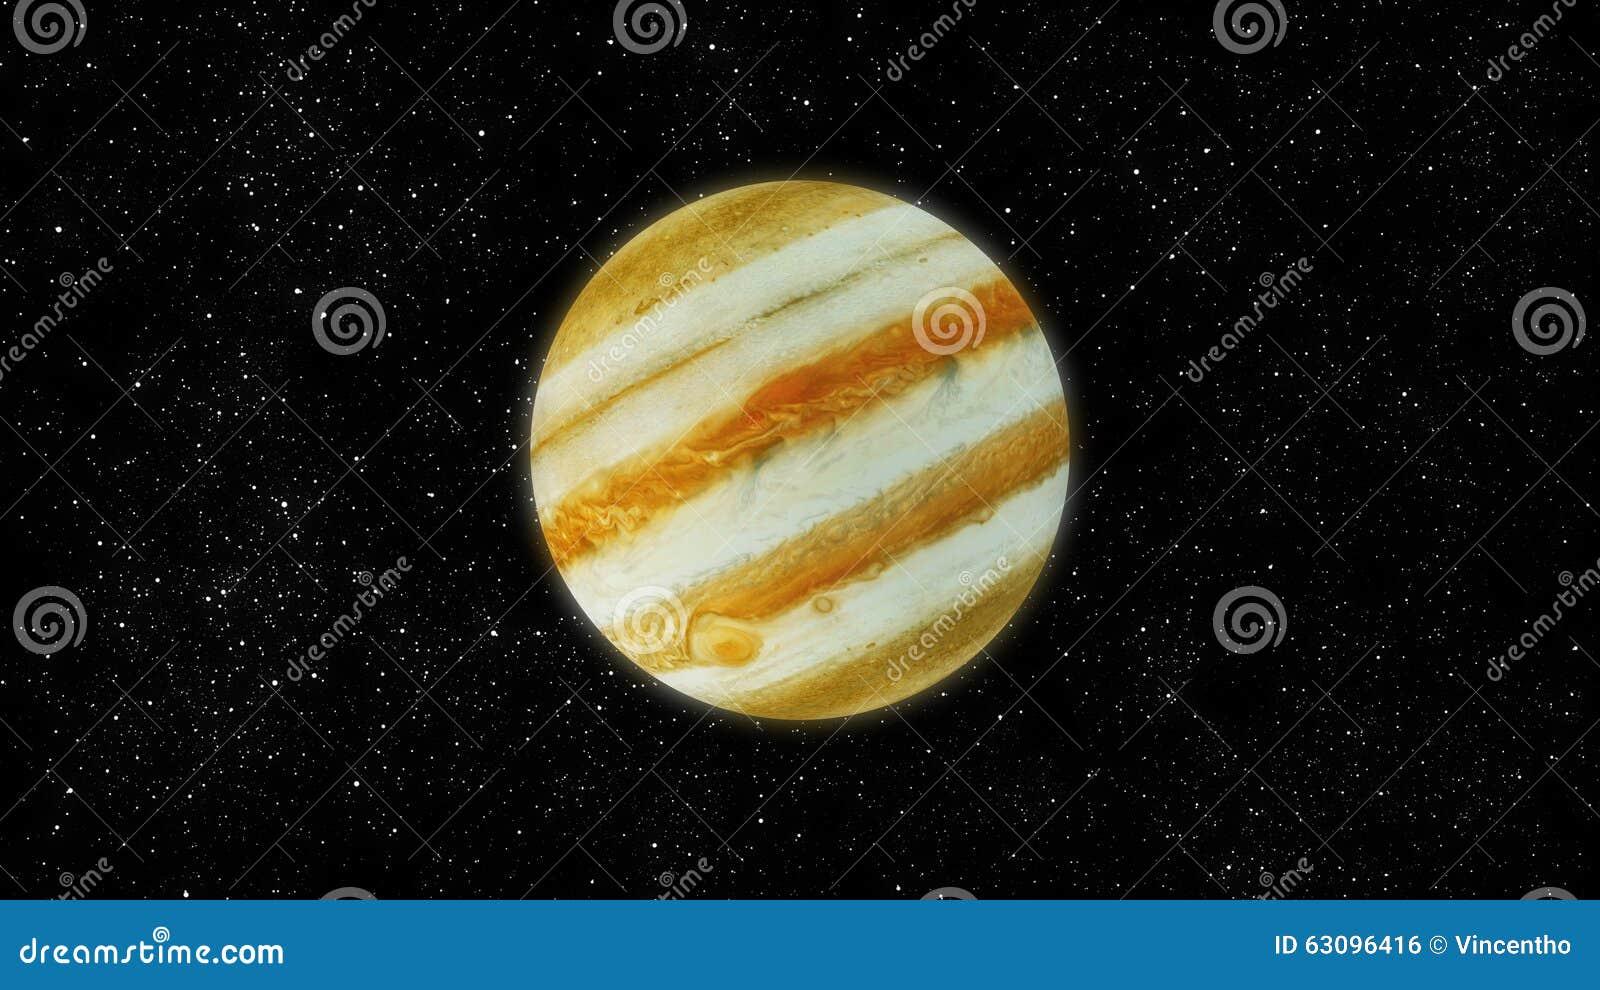 jupiter fifth planet - photo #16